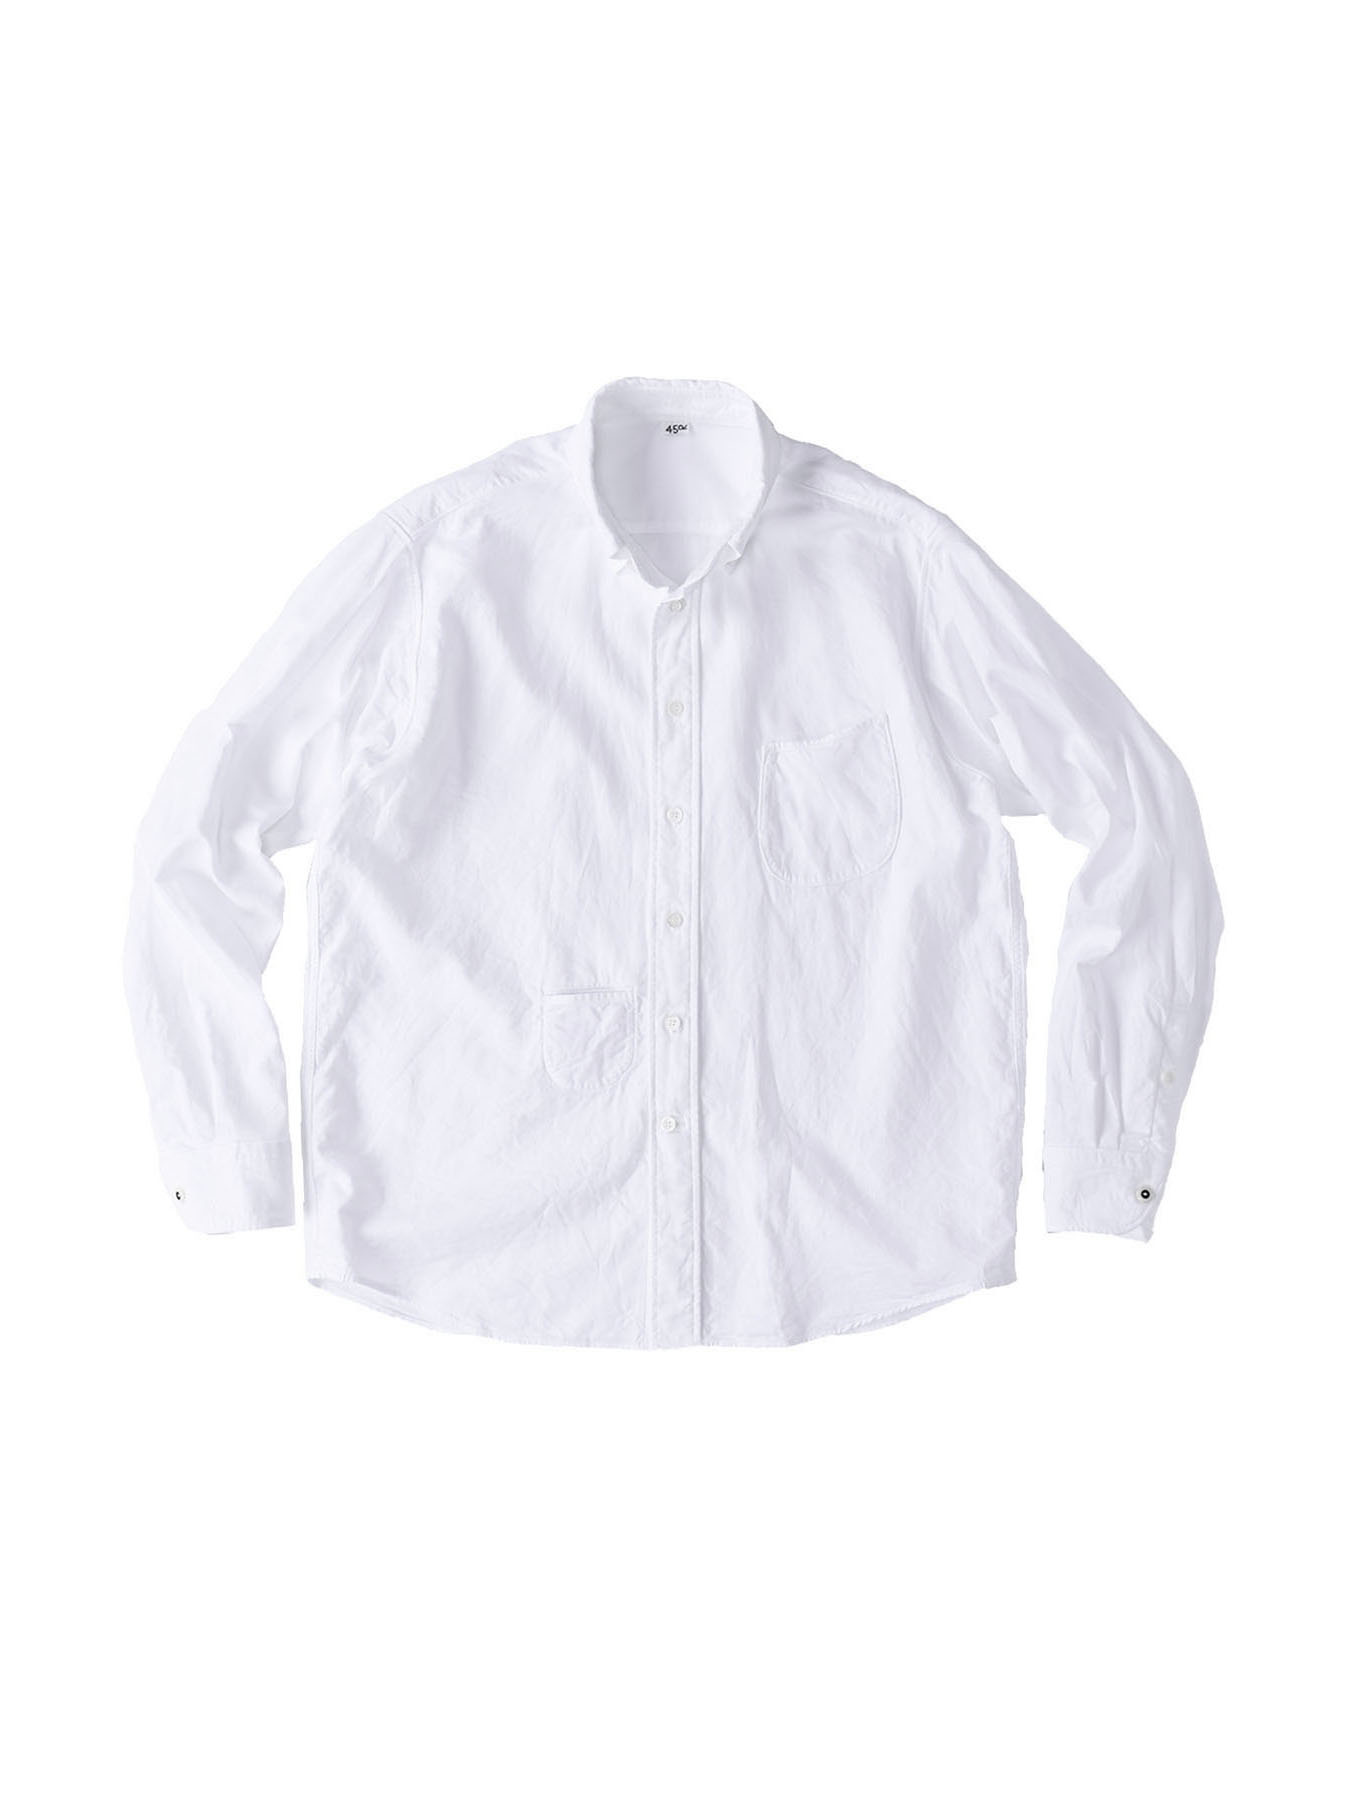 Gauze 908 Ocean Shirt-1